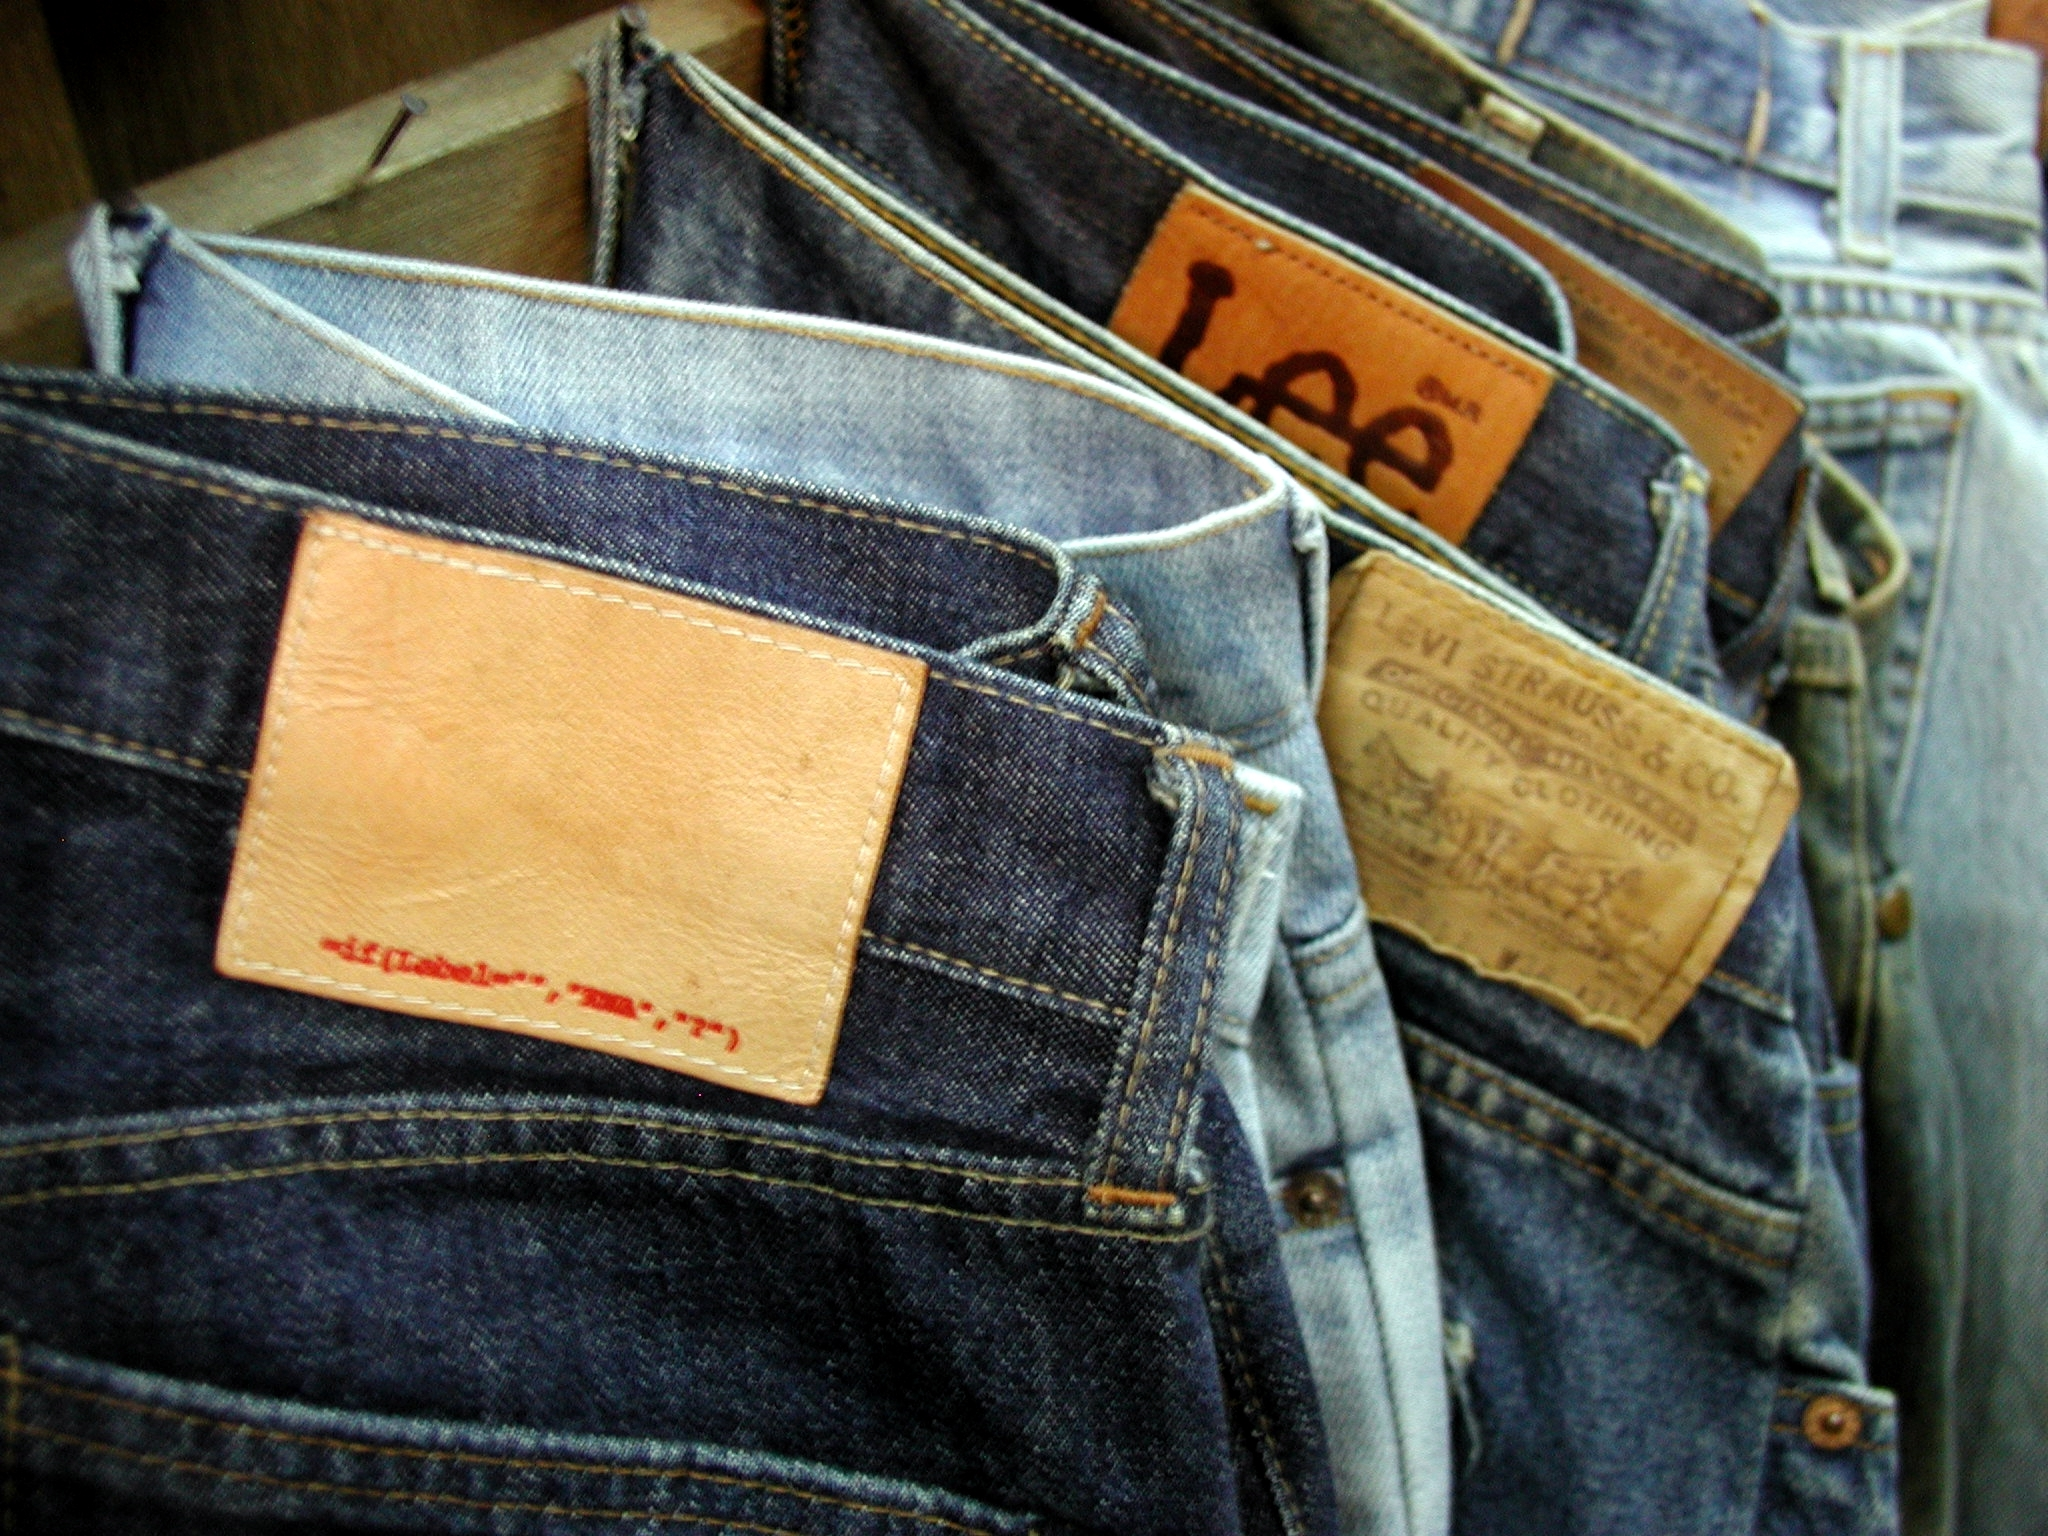 Broken_counterfeit_jeans.jpg